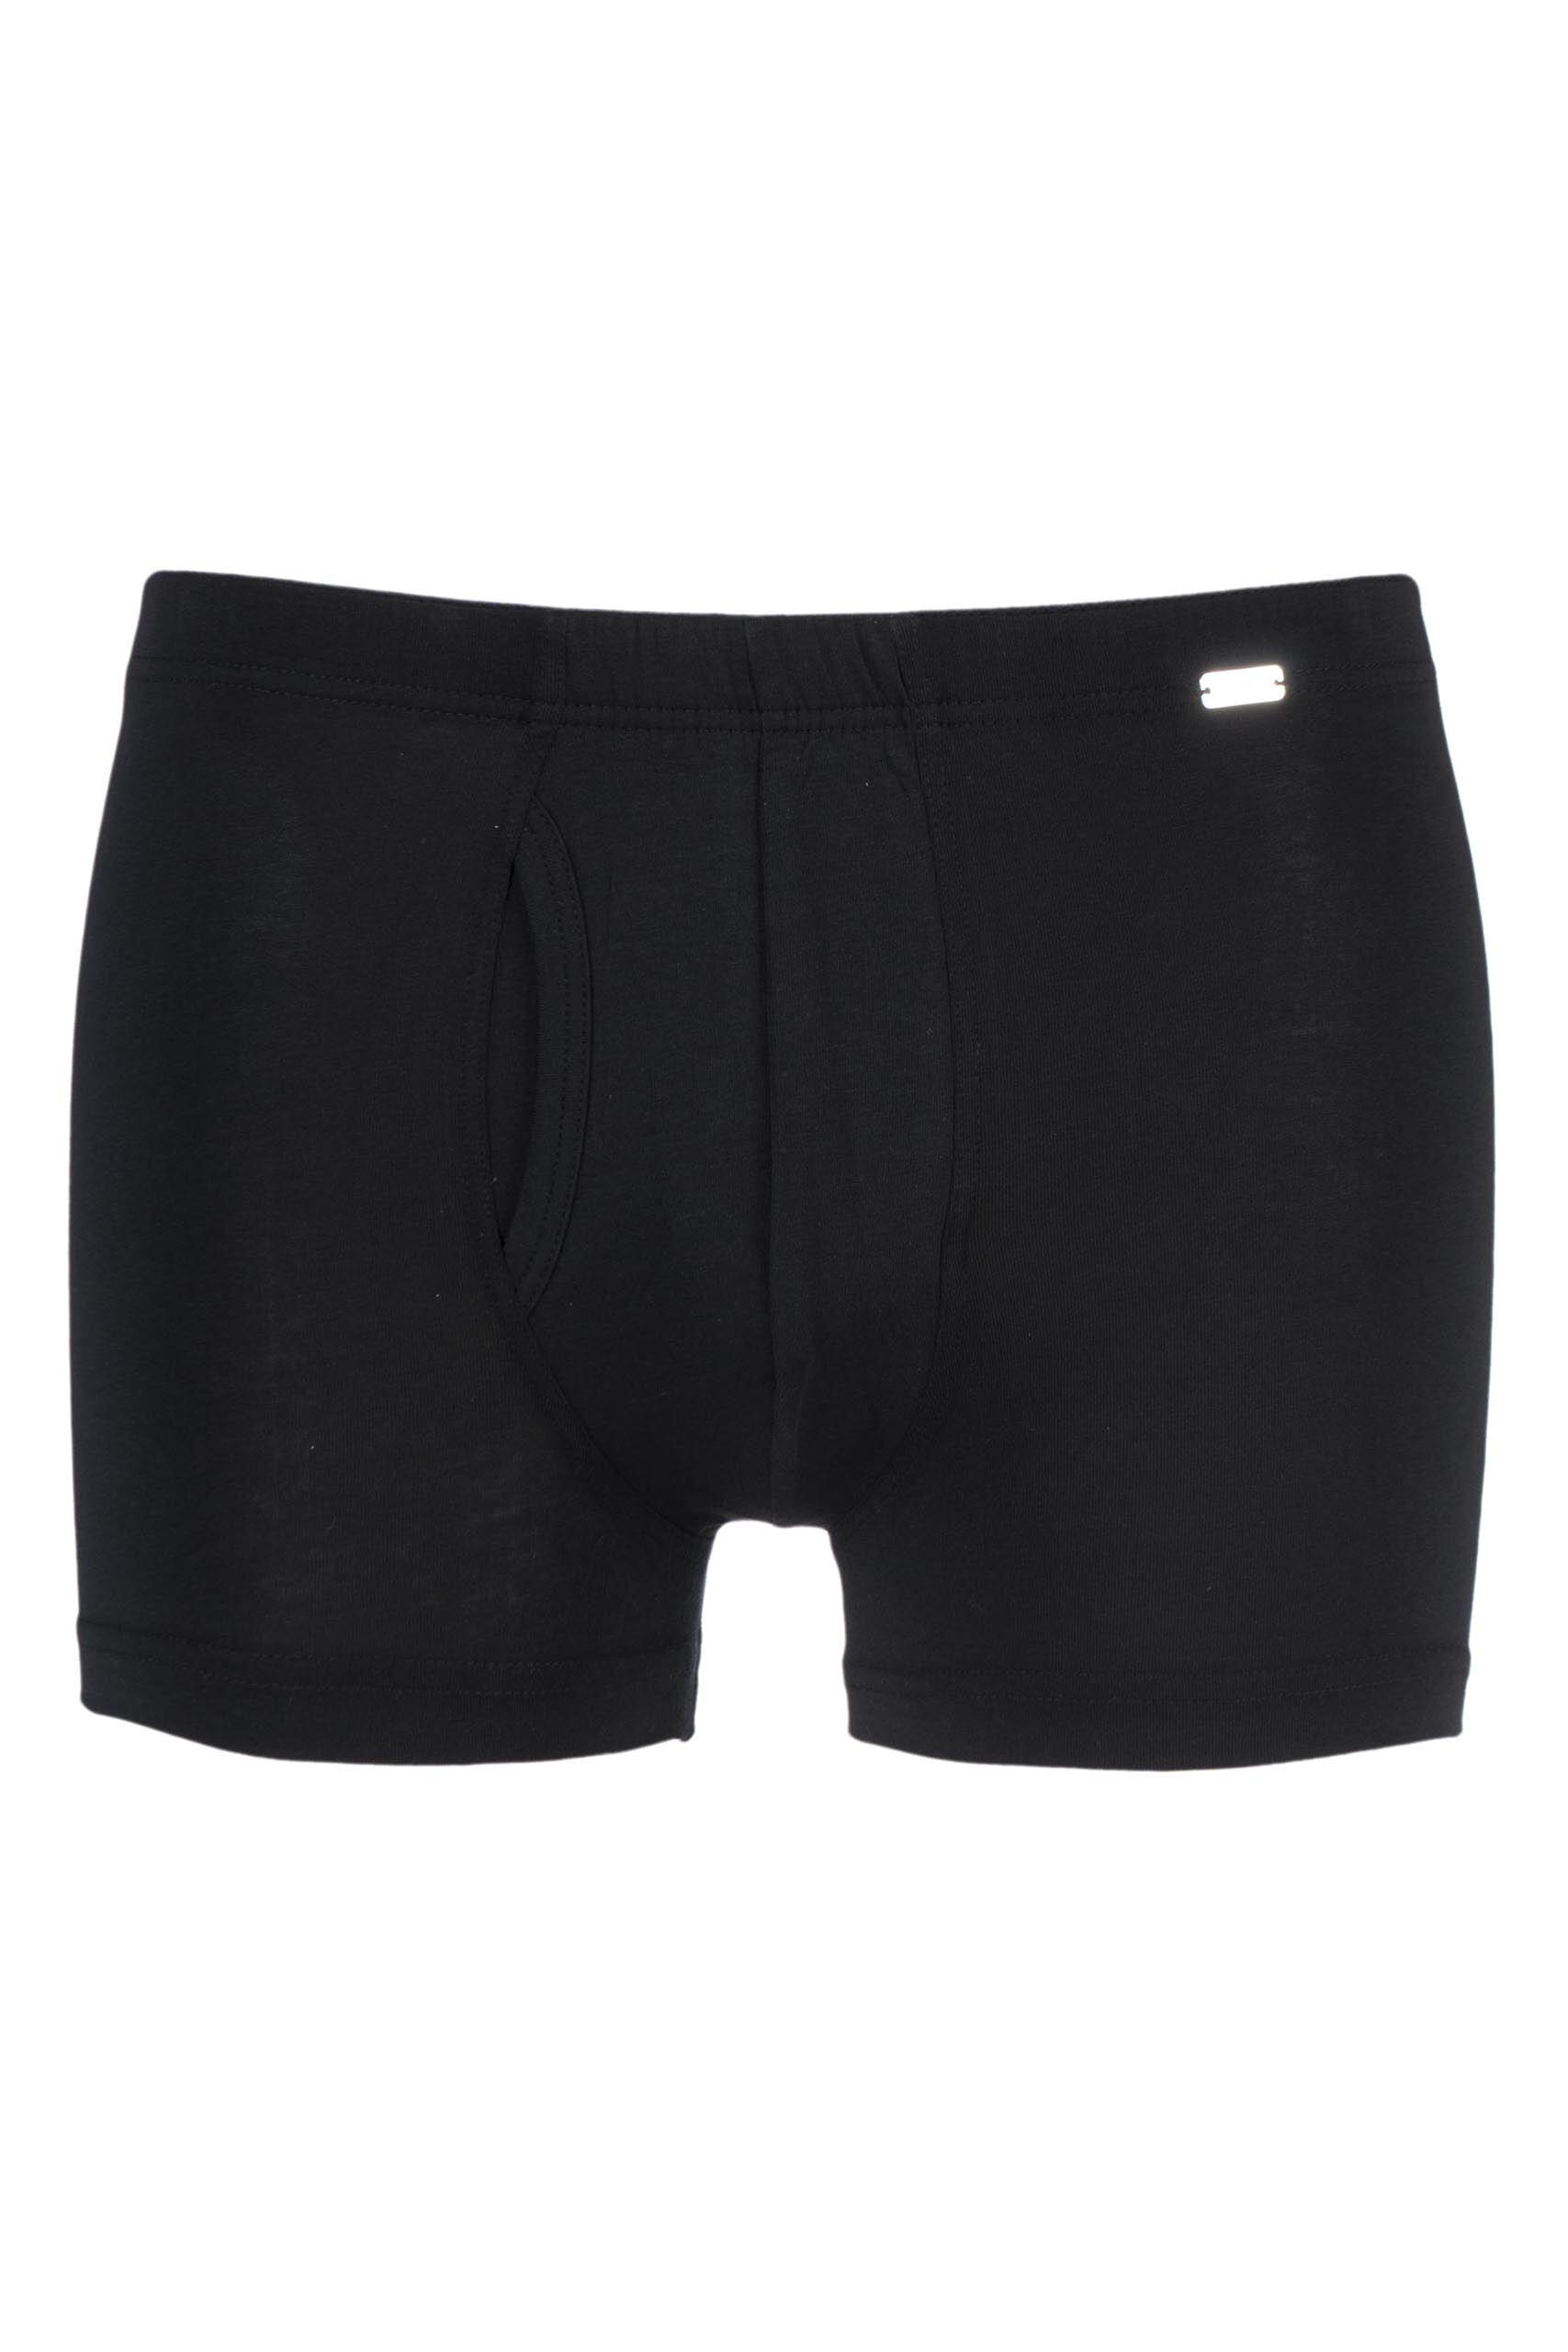 Image of 1 Pack Black Modern Stretch Comfort Trunks Men's Extra Large - Jockey